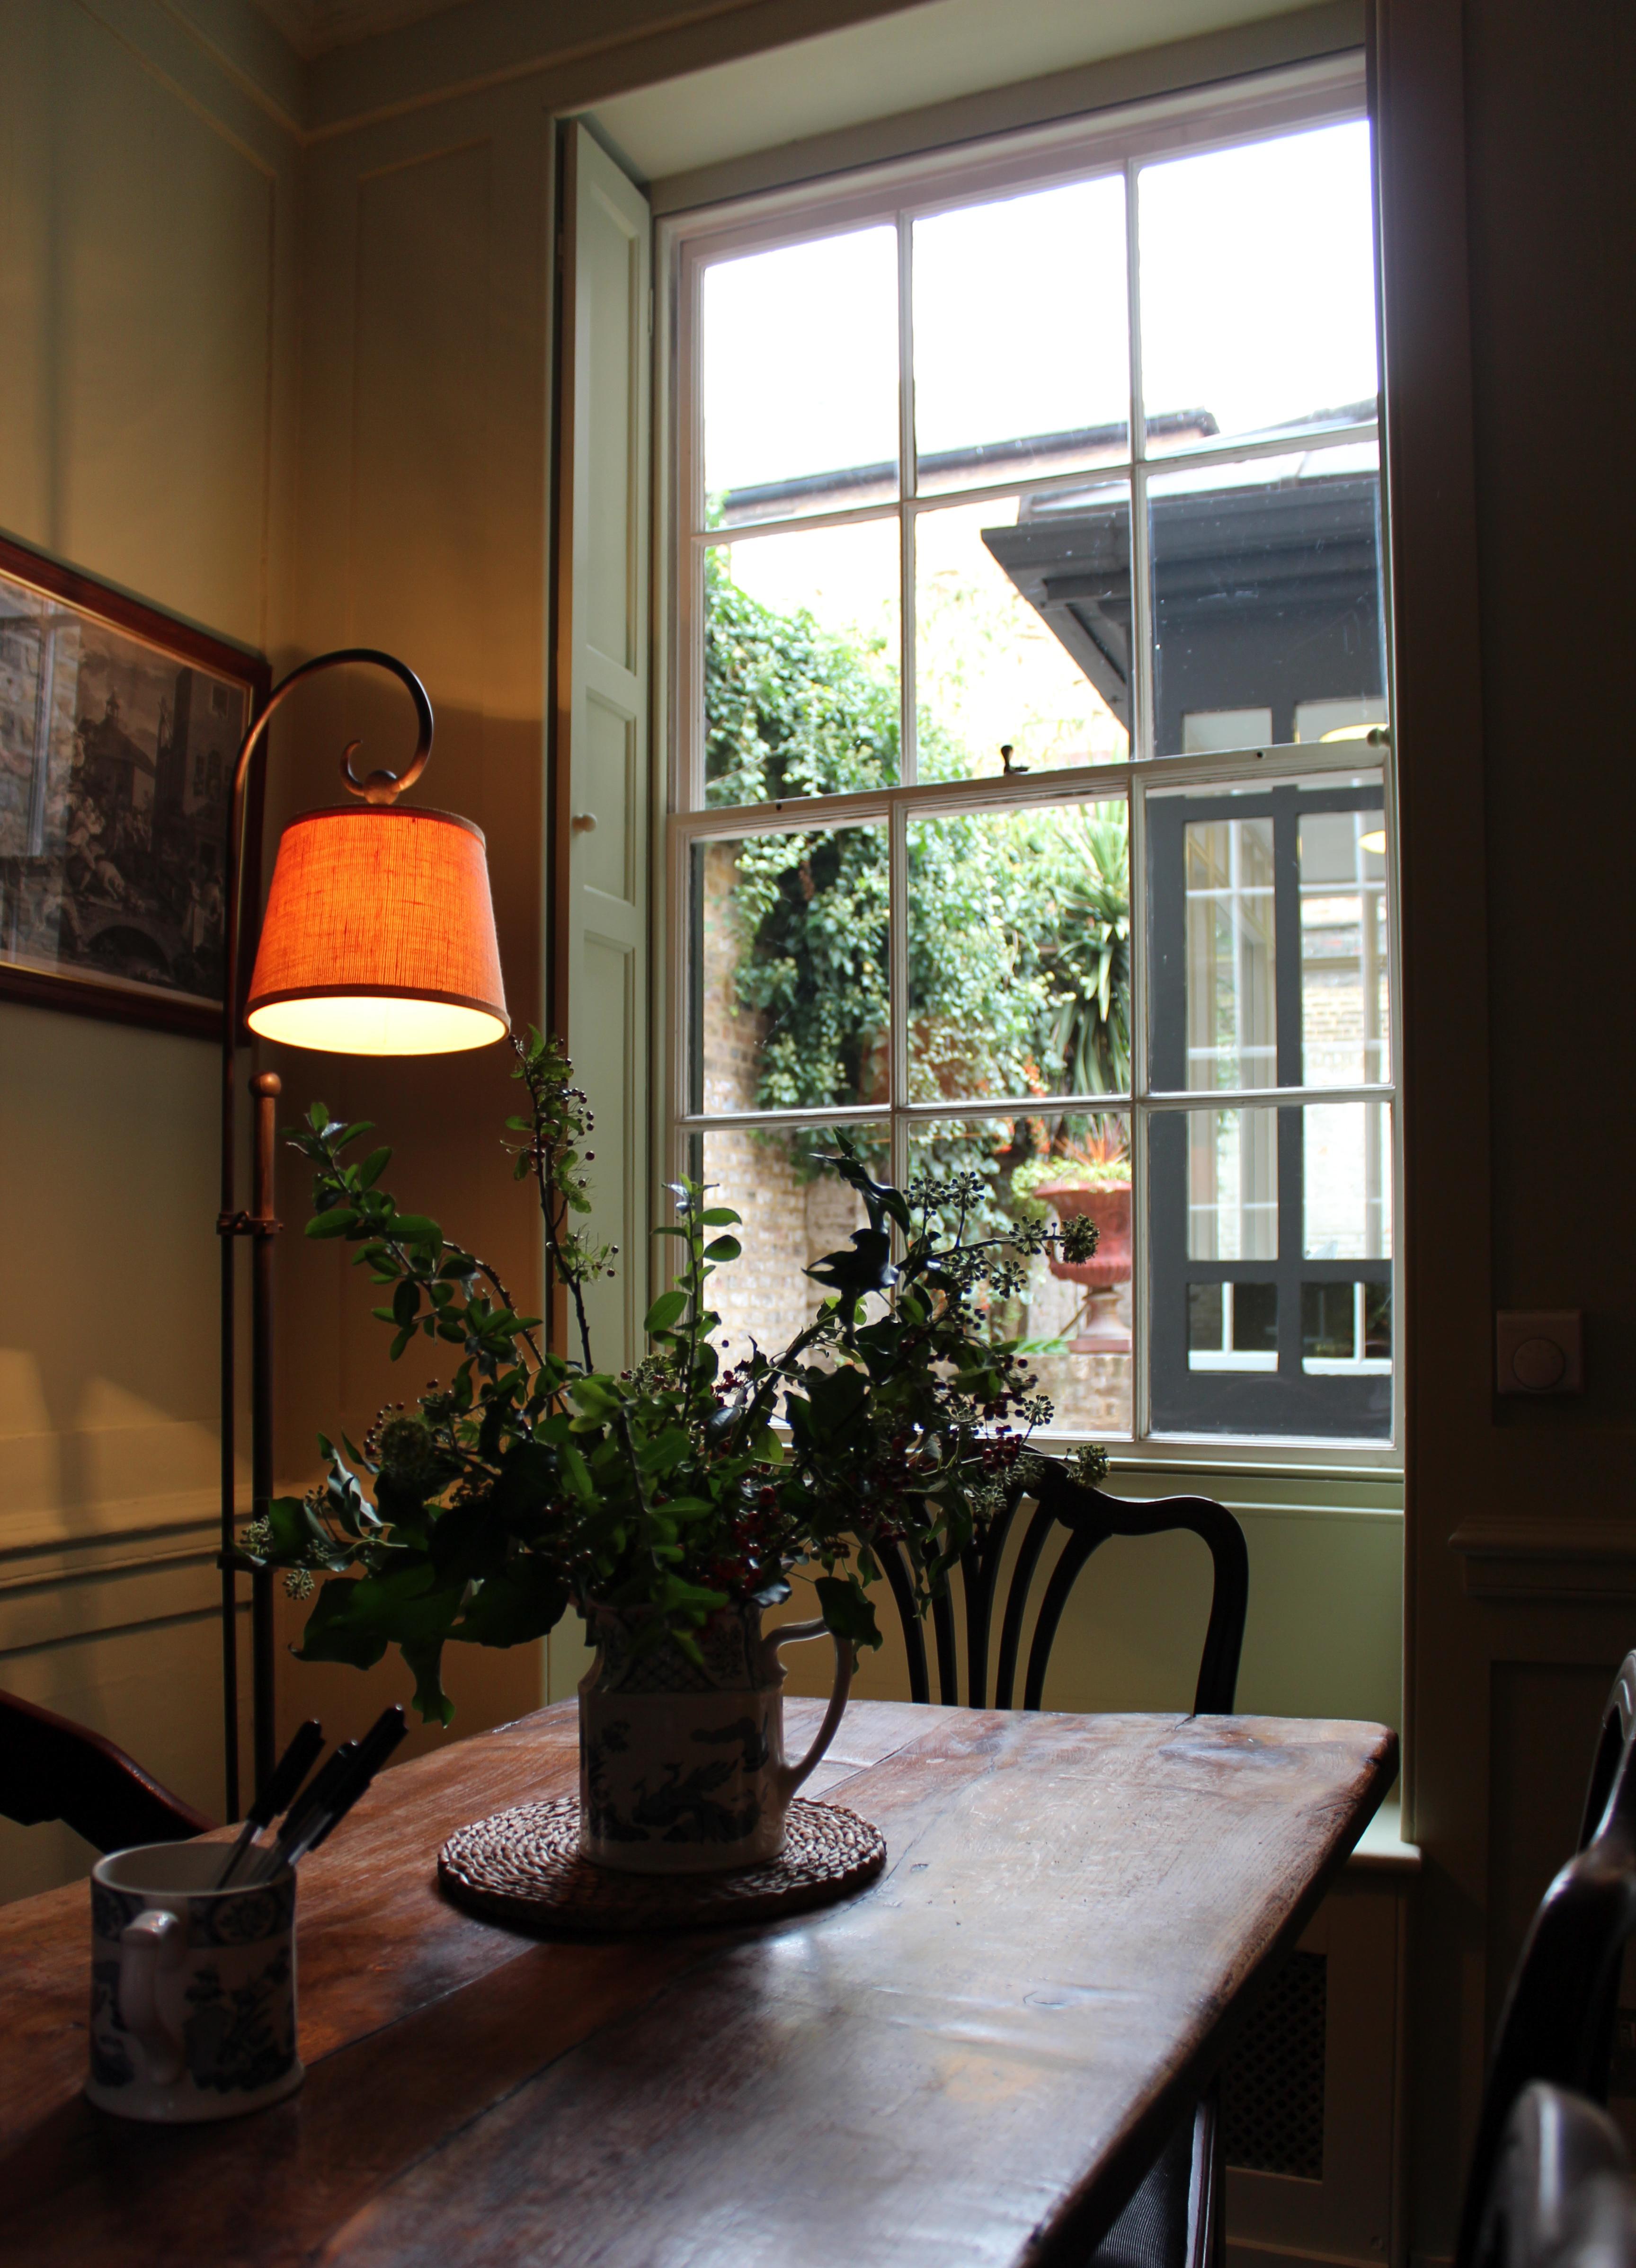 8 Essential Elements for Planning a Cottage Garden